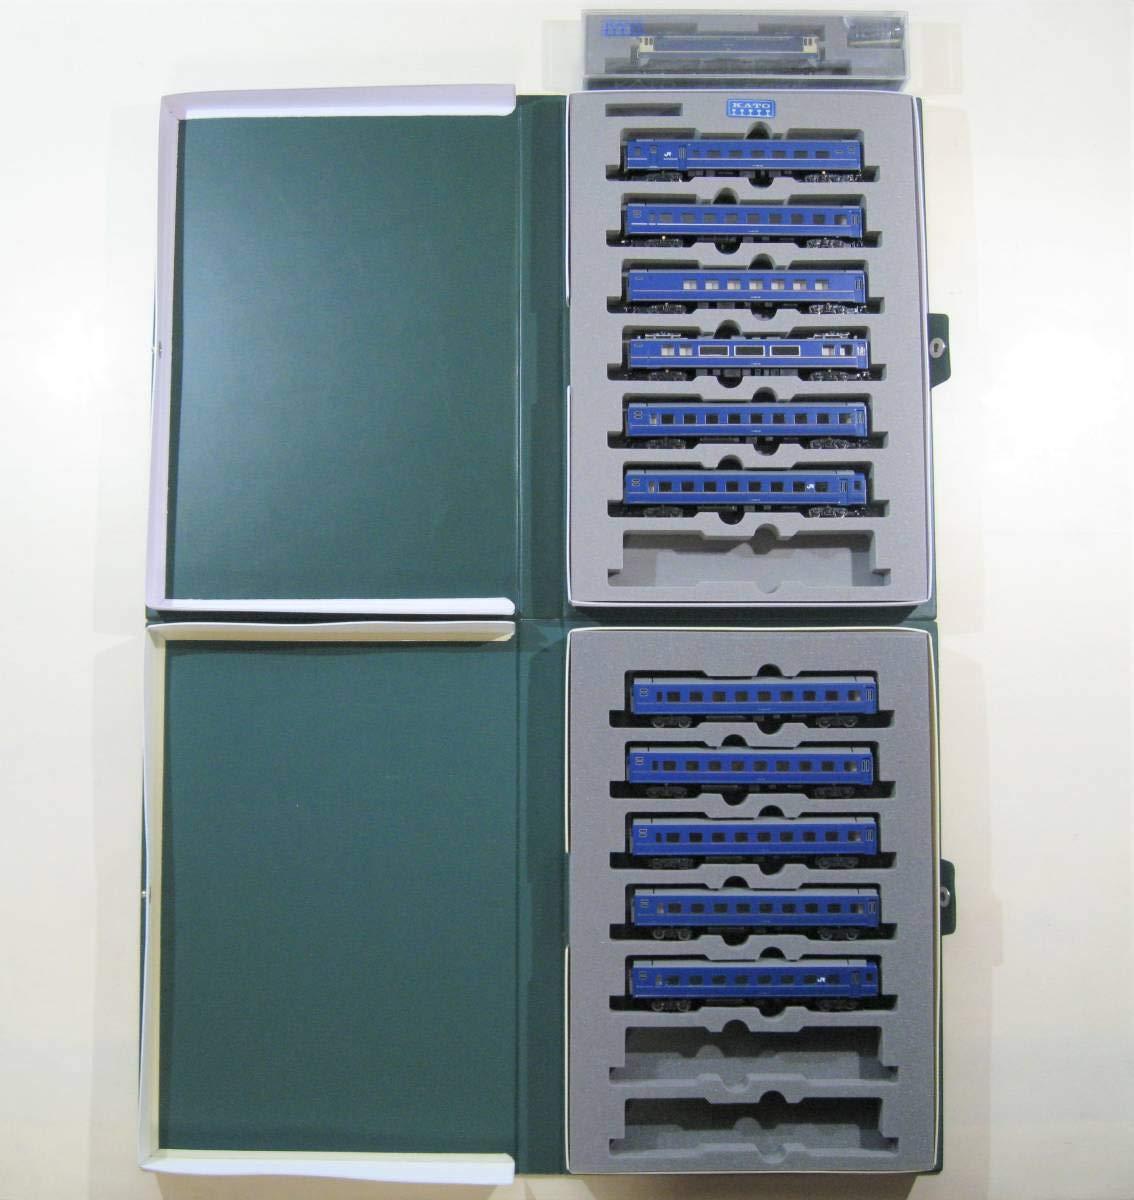 kato 3061 EF65 1000 後期形+24系25形 瀬戸あさかぜ スハ25 ラウンジカー オハネフ25 300 豪華セットA B07L58B8MZ